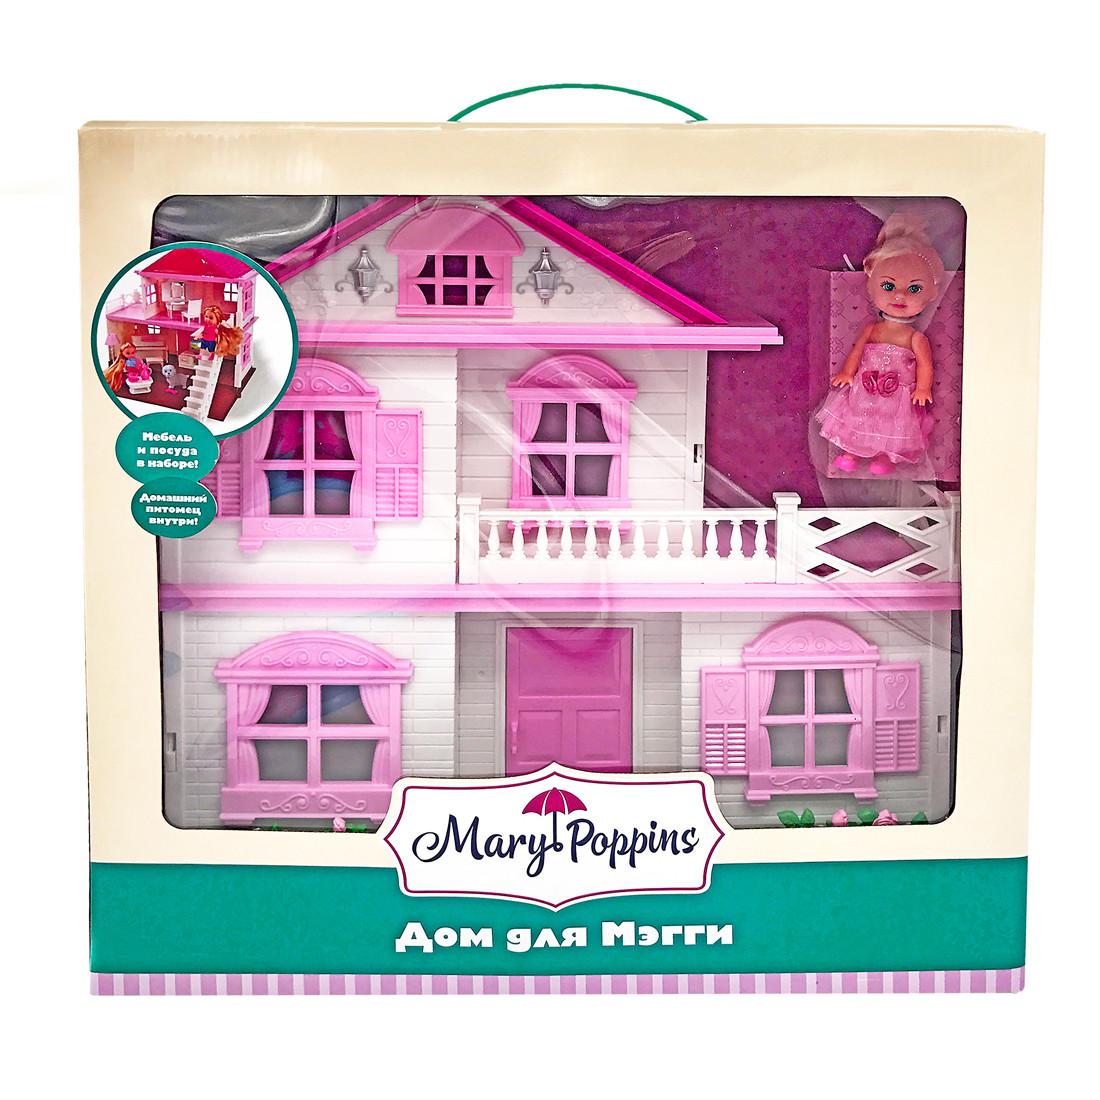 Домики для кукол Mary Poppins Дом Mary Poppins для Мэгги с куклой, мебелью и аксесс. цены